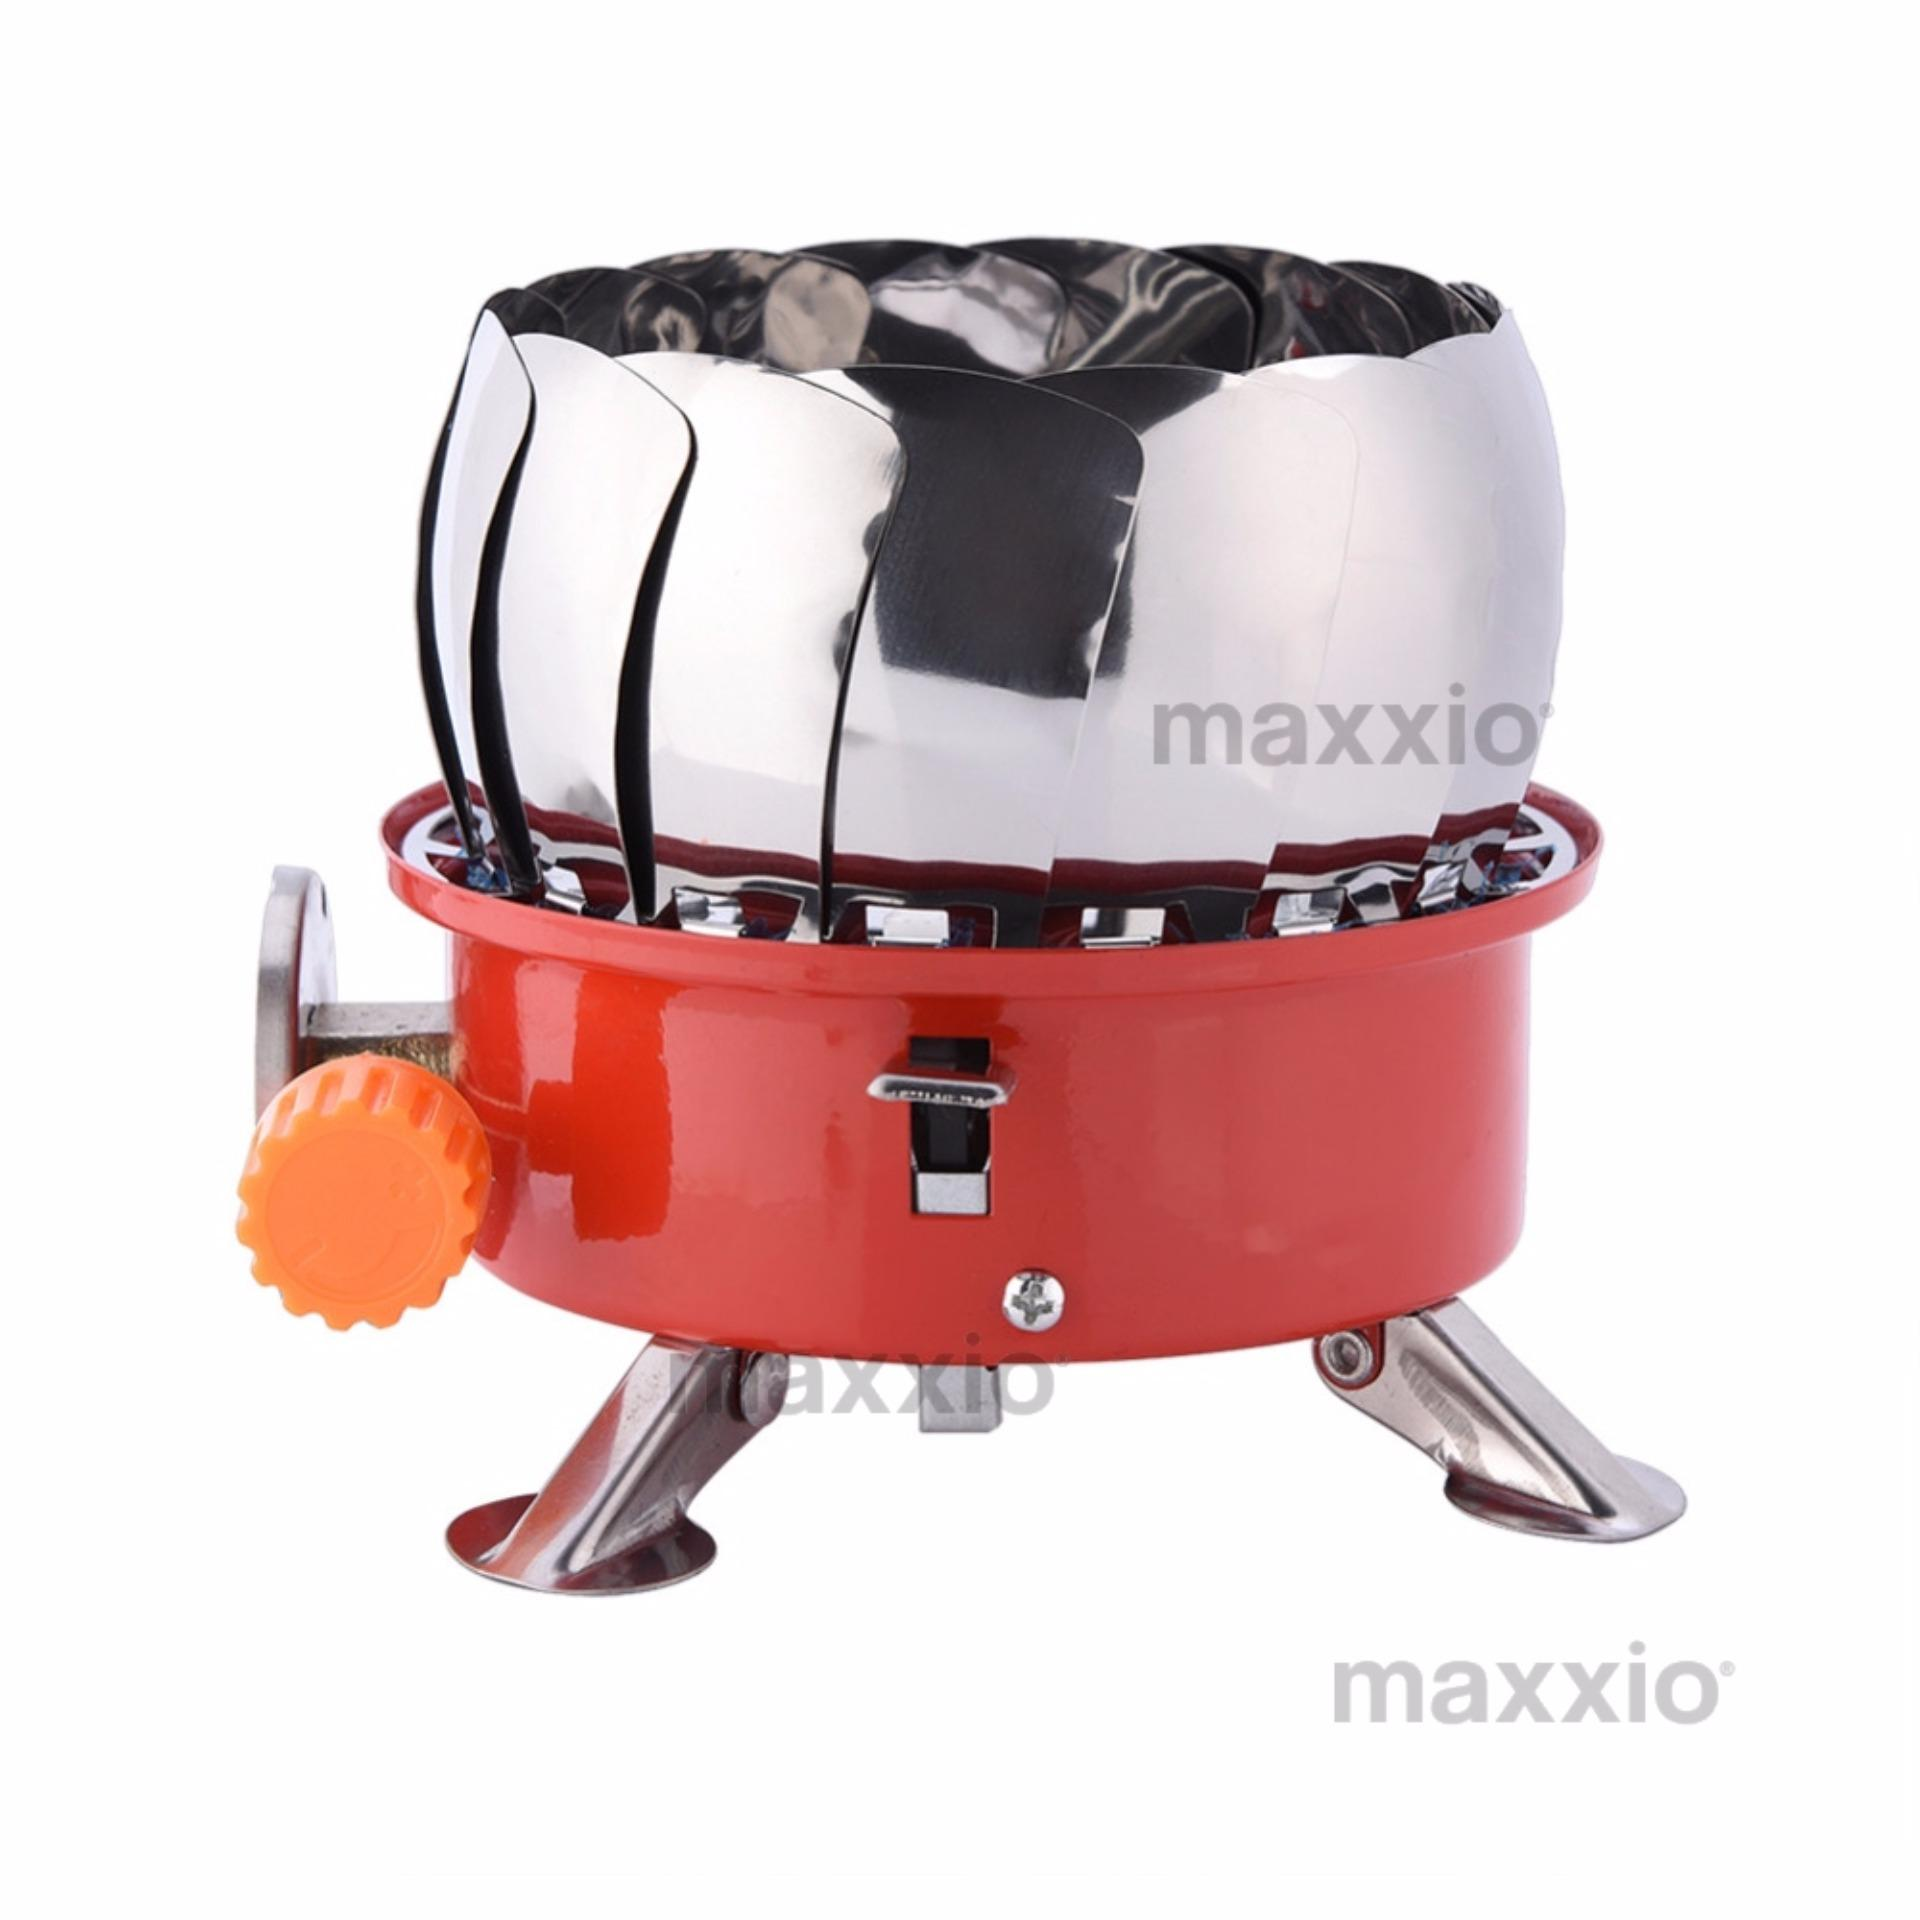 Periksa Peringkat Maxxio Wind Proof Kompor Portabel Anti Angin Kembang Windproof Camping Portable Stove